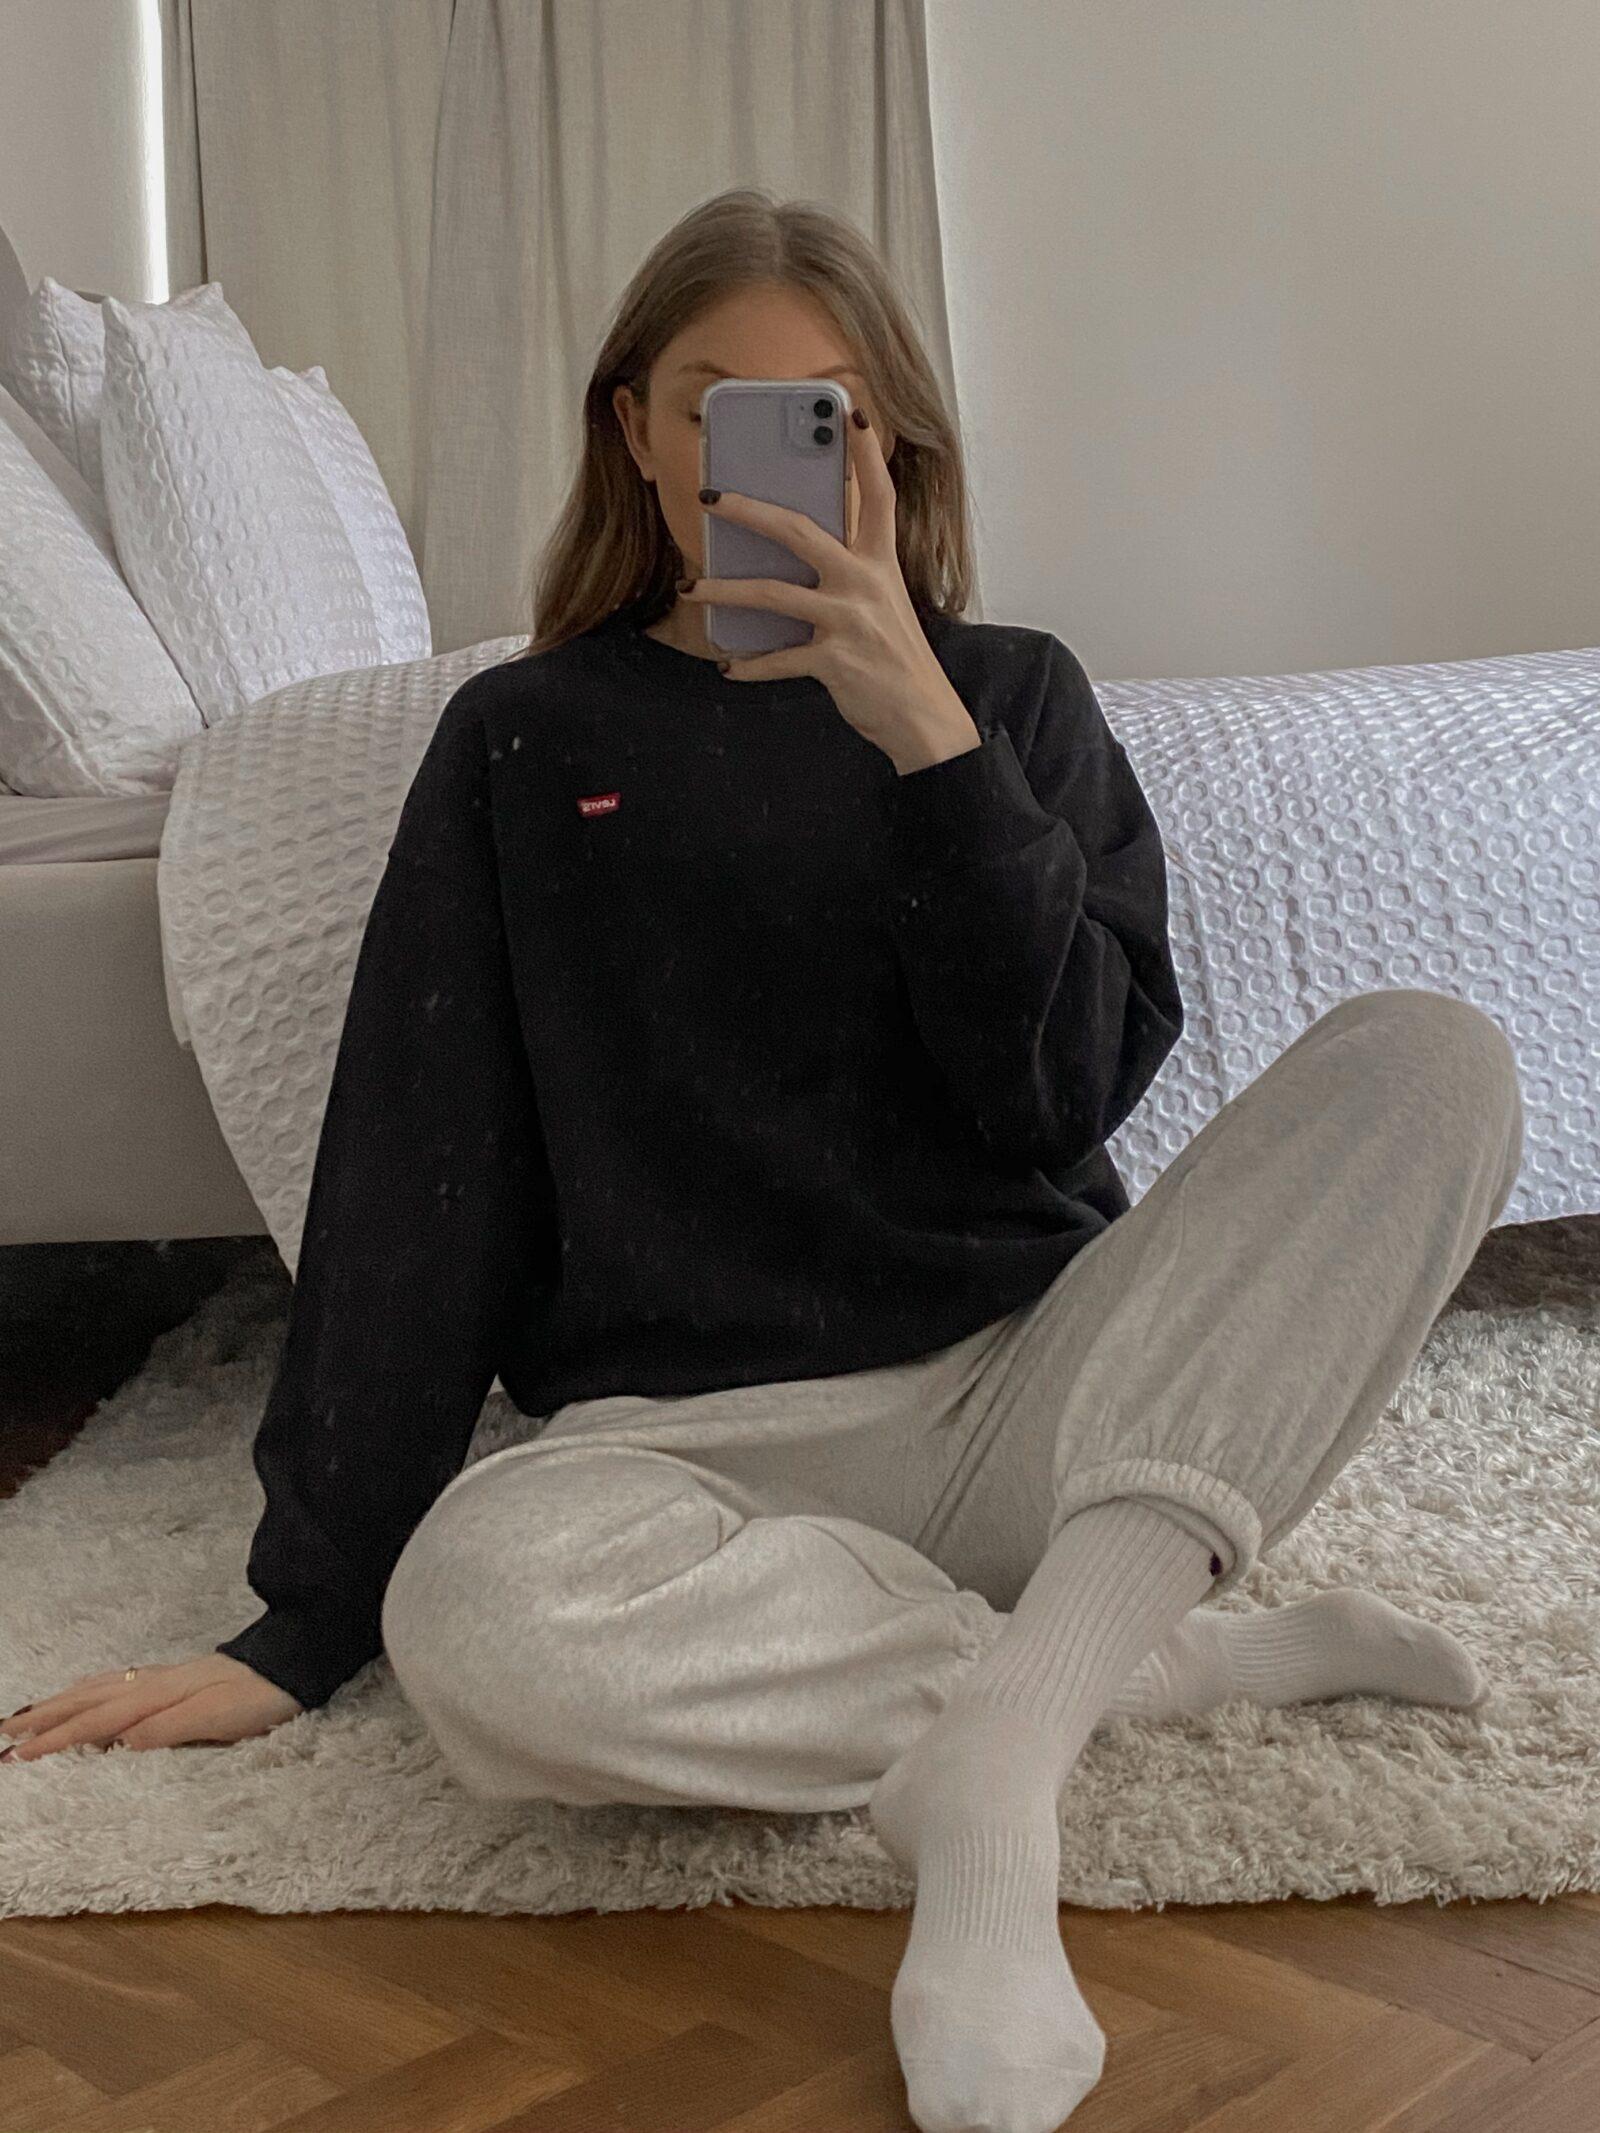 Amazon Black Friday Deals - Levis Black Sweatshirt